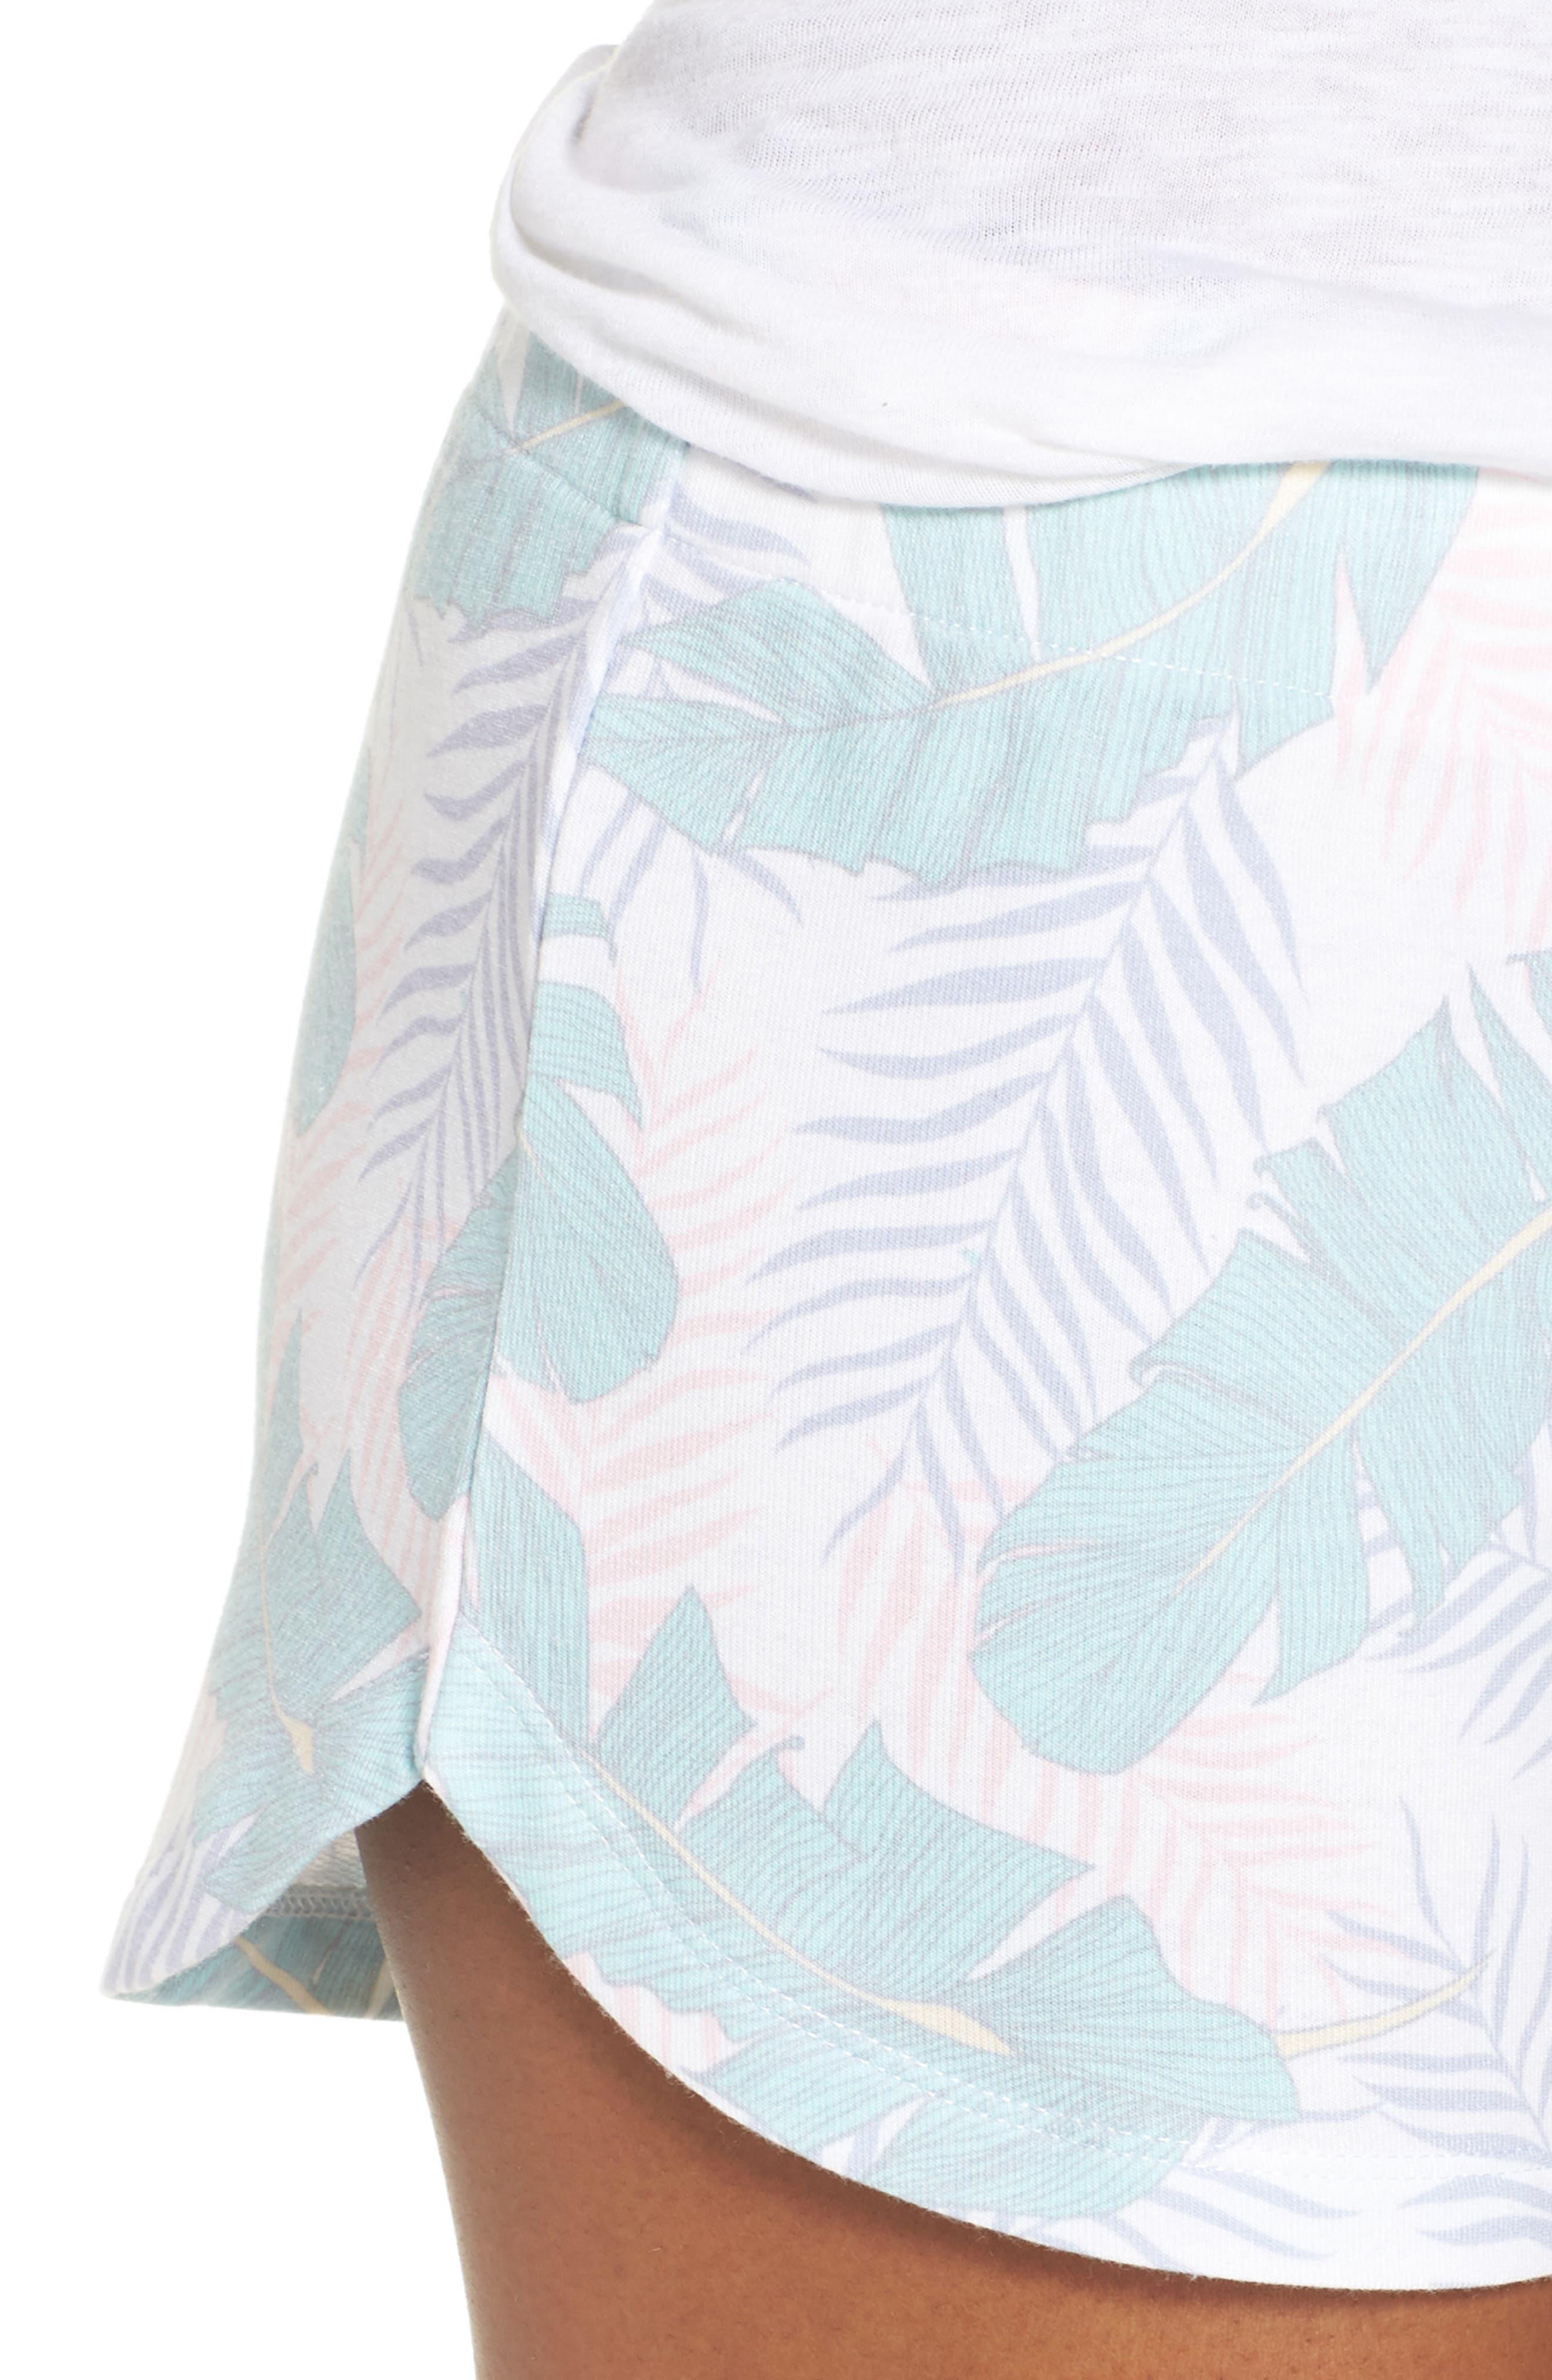 Lounge Shorts,                             Alternate thumbnail 4, color,                             100